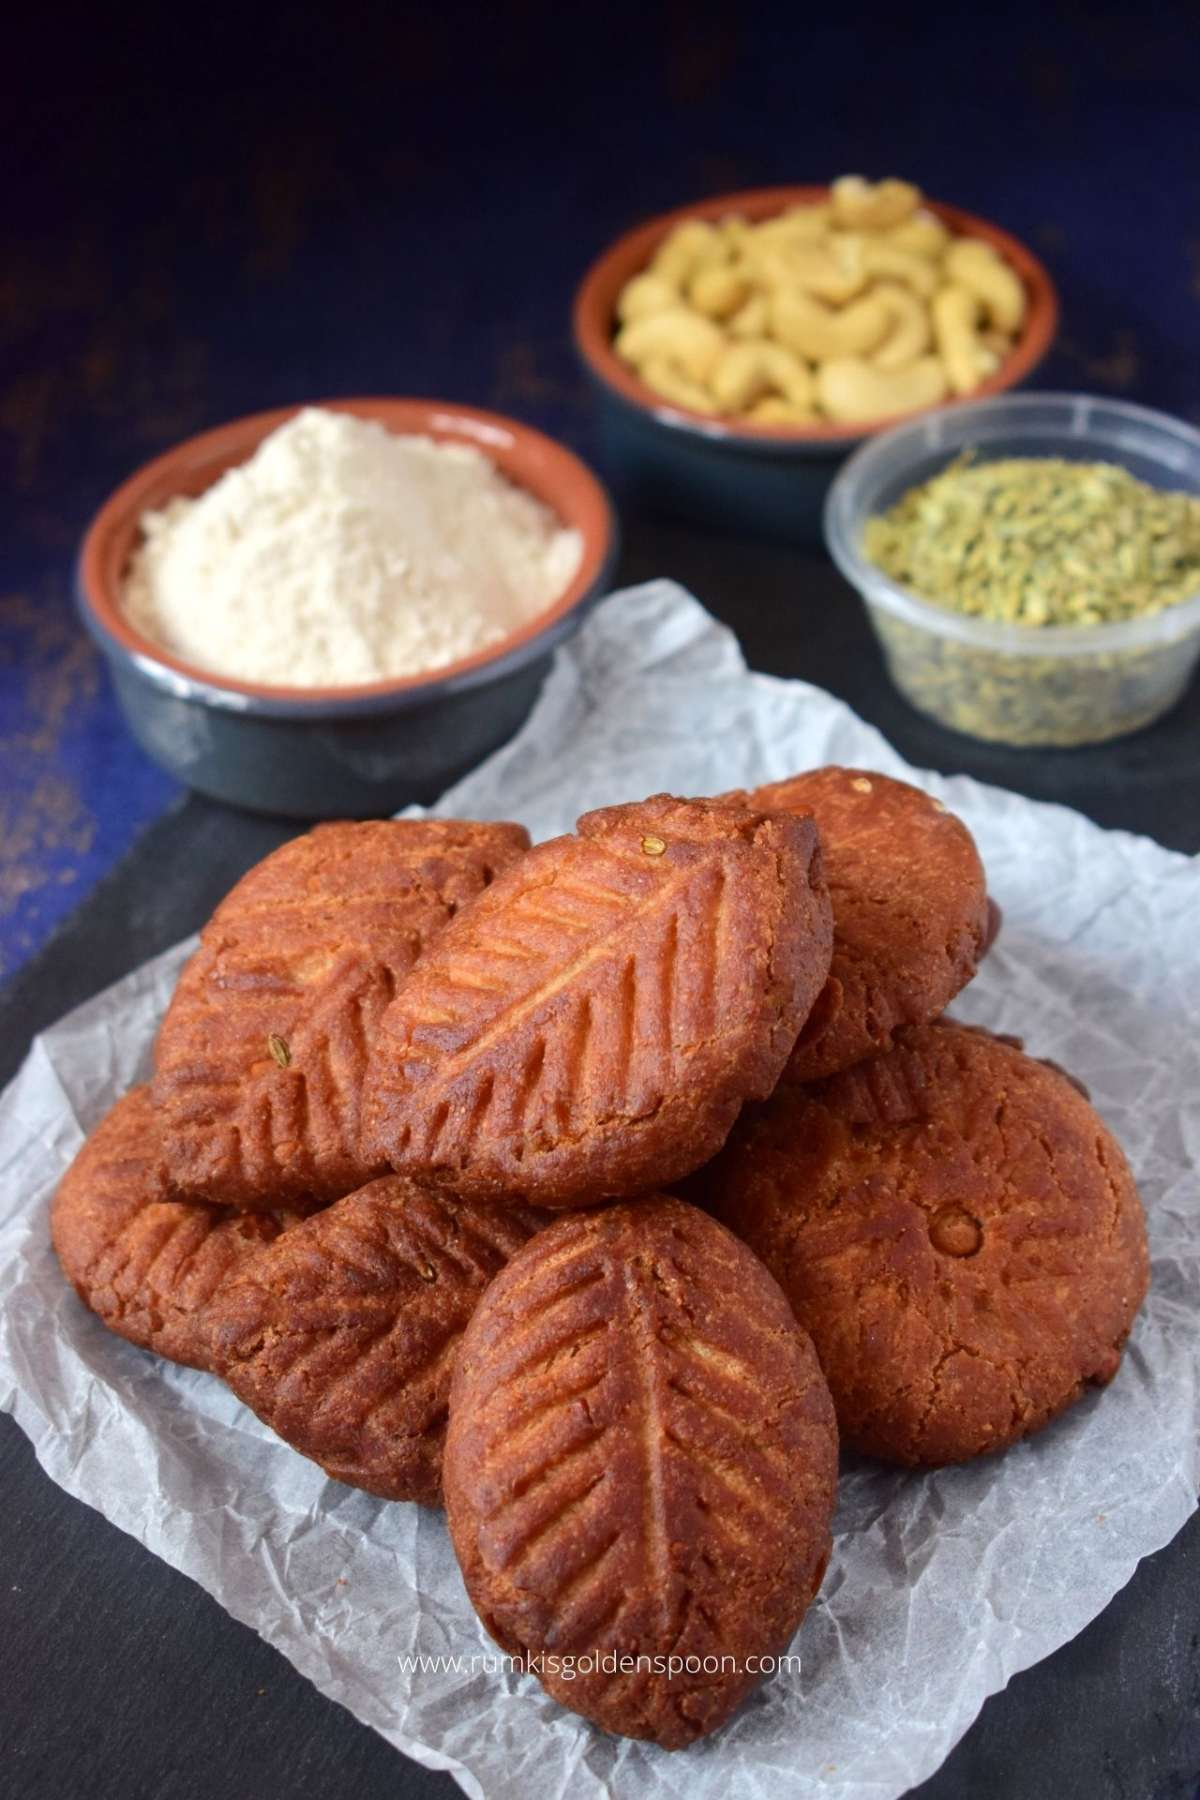 thekua recipe, recipe for thekua, recipe of thekua, khajur recipe, how to make thekua, khajoor recipe , thekua recipe with jaggery, khajur banane ki recipe, khajur ki recipe, khajur sweet recipe, khasta thekua, khasta thekua recipe, bihari thekua, thekua recipe bengali, recipe of khajur, how to make thekua recipe, how to make thekua at home, bihari thekua recipe, gur thekua recipe, crispy thekua recipe, thekua banana recipe, thekua sweet recipe, Bihari recipe, chhath puja recipes, Rumki's Golden Spoon